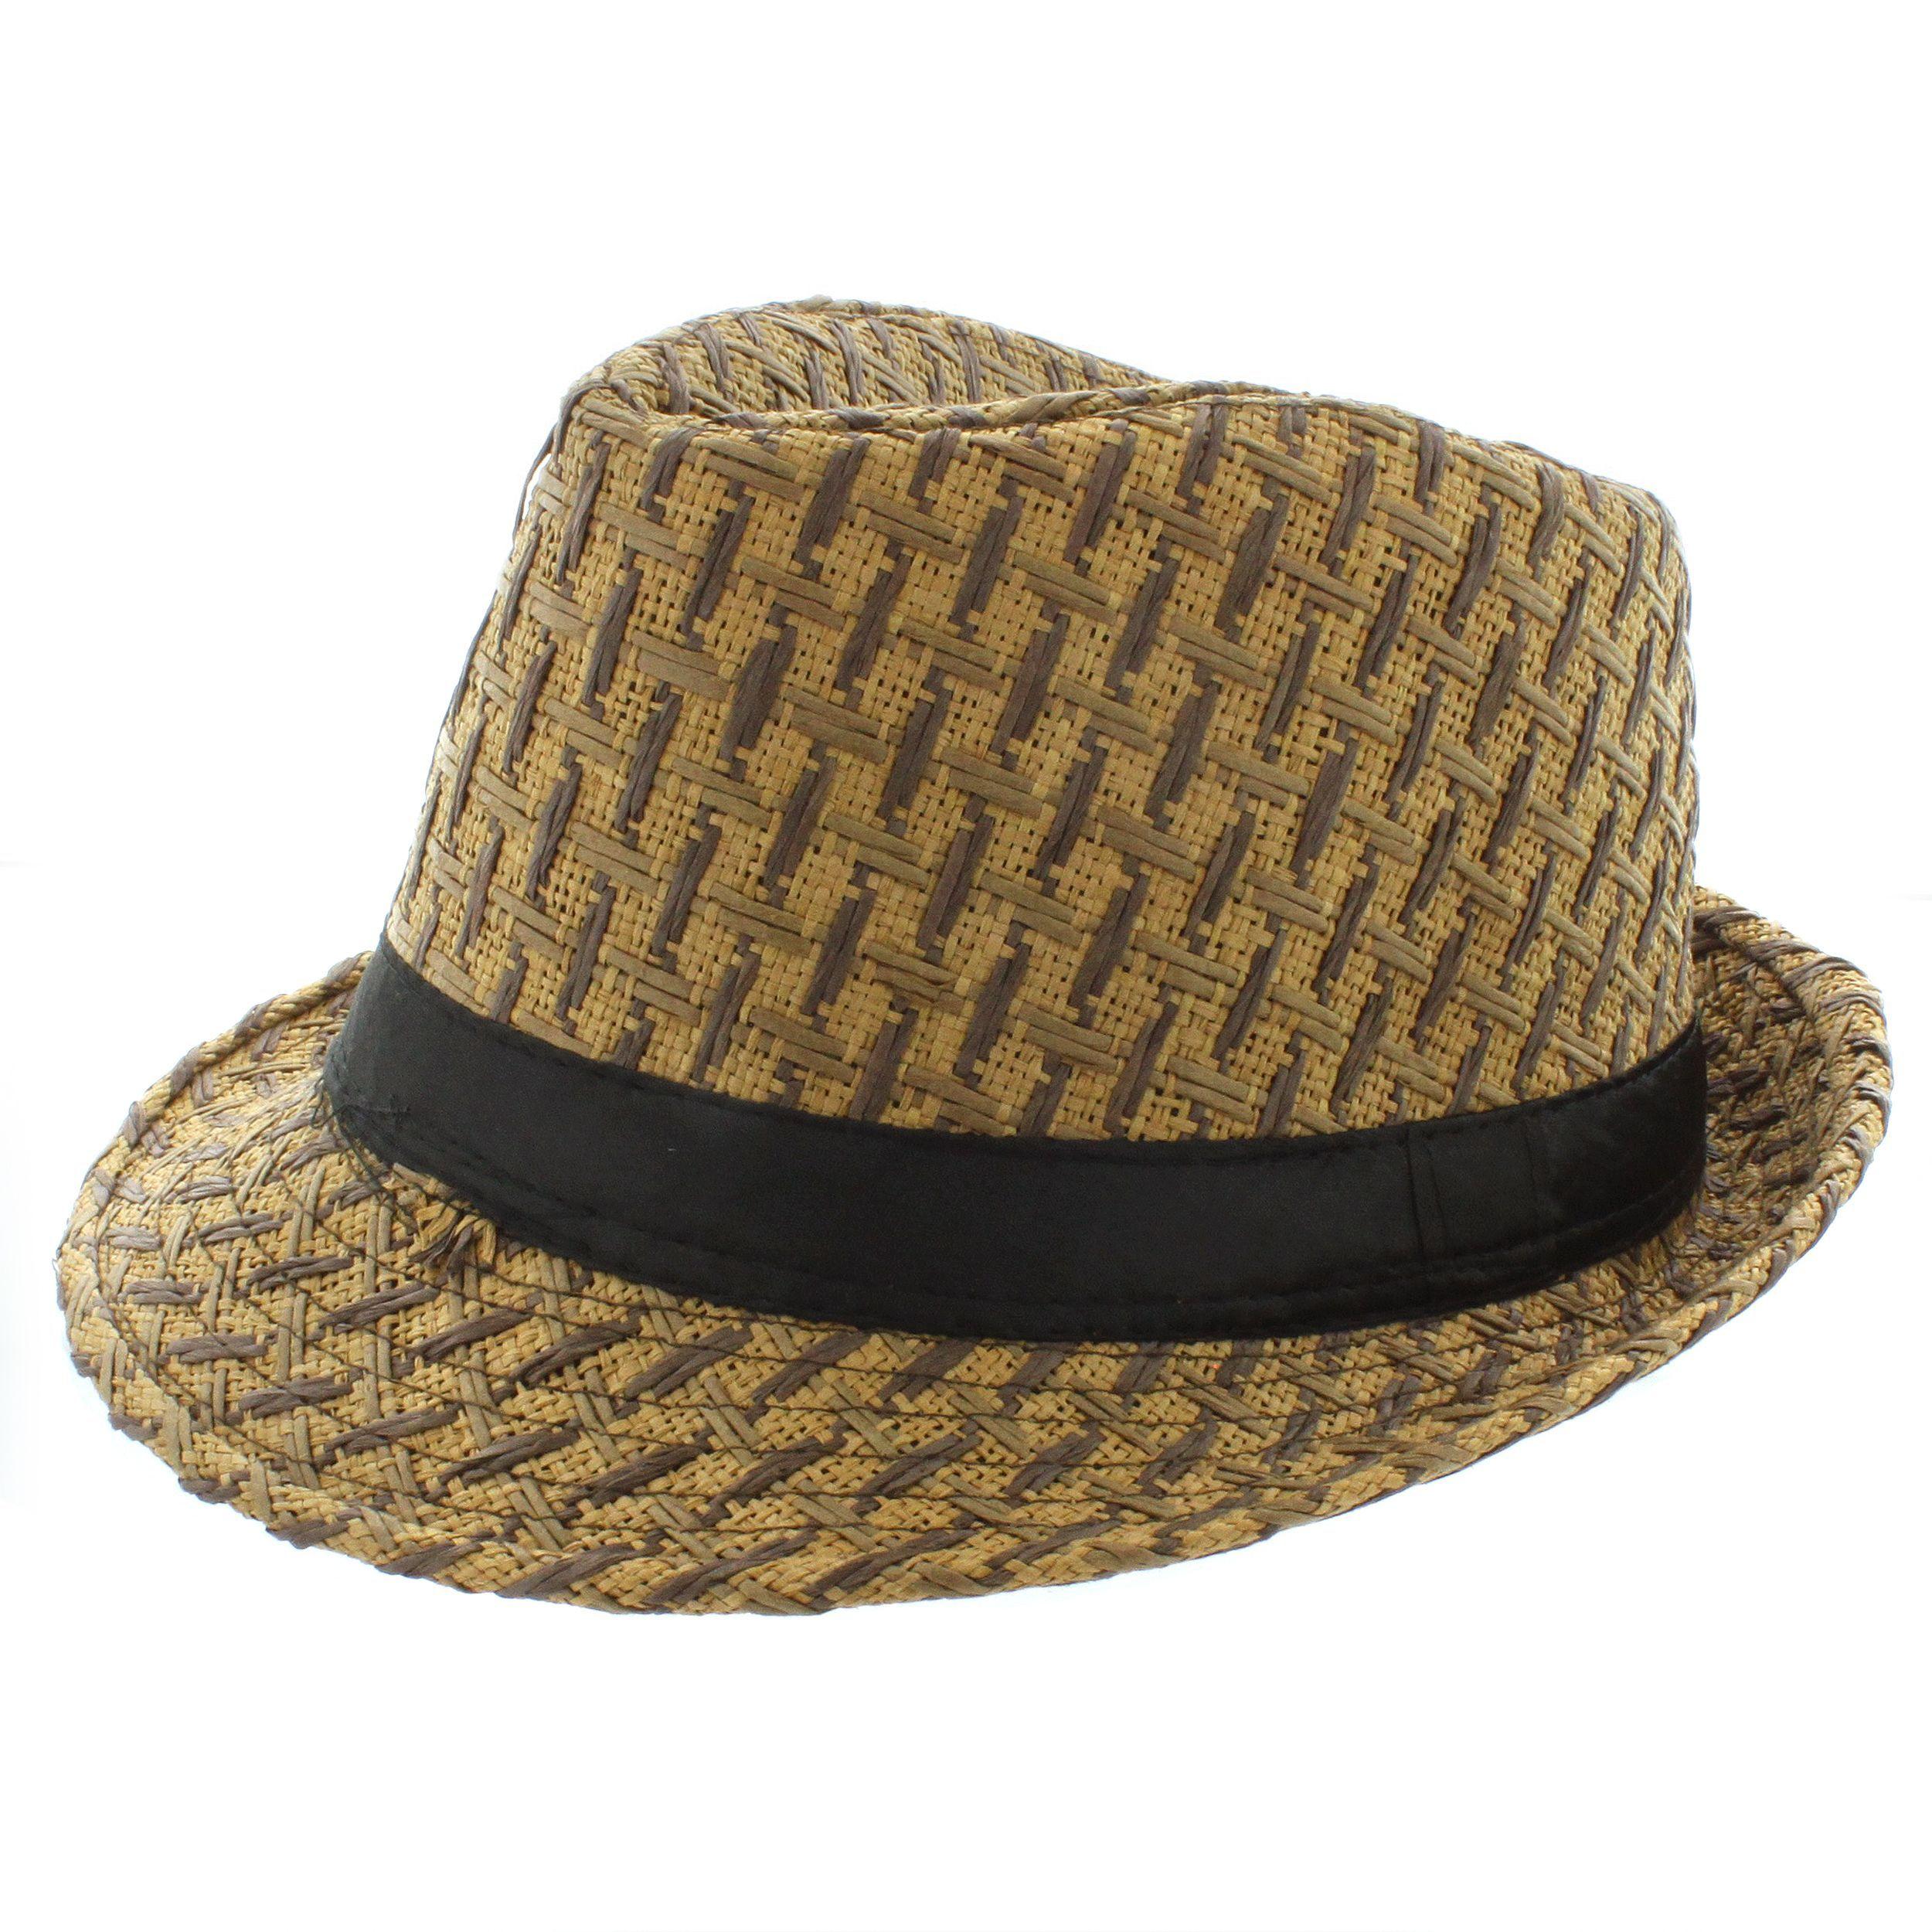 b115865410d Mens Summer Fedora Brown Stripe Band Cuban Style Upturn Short Brim Hat-S M